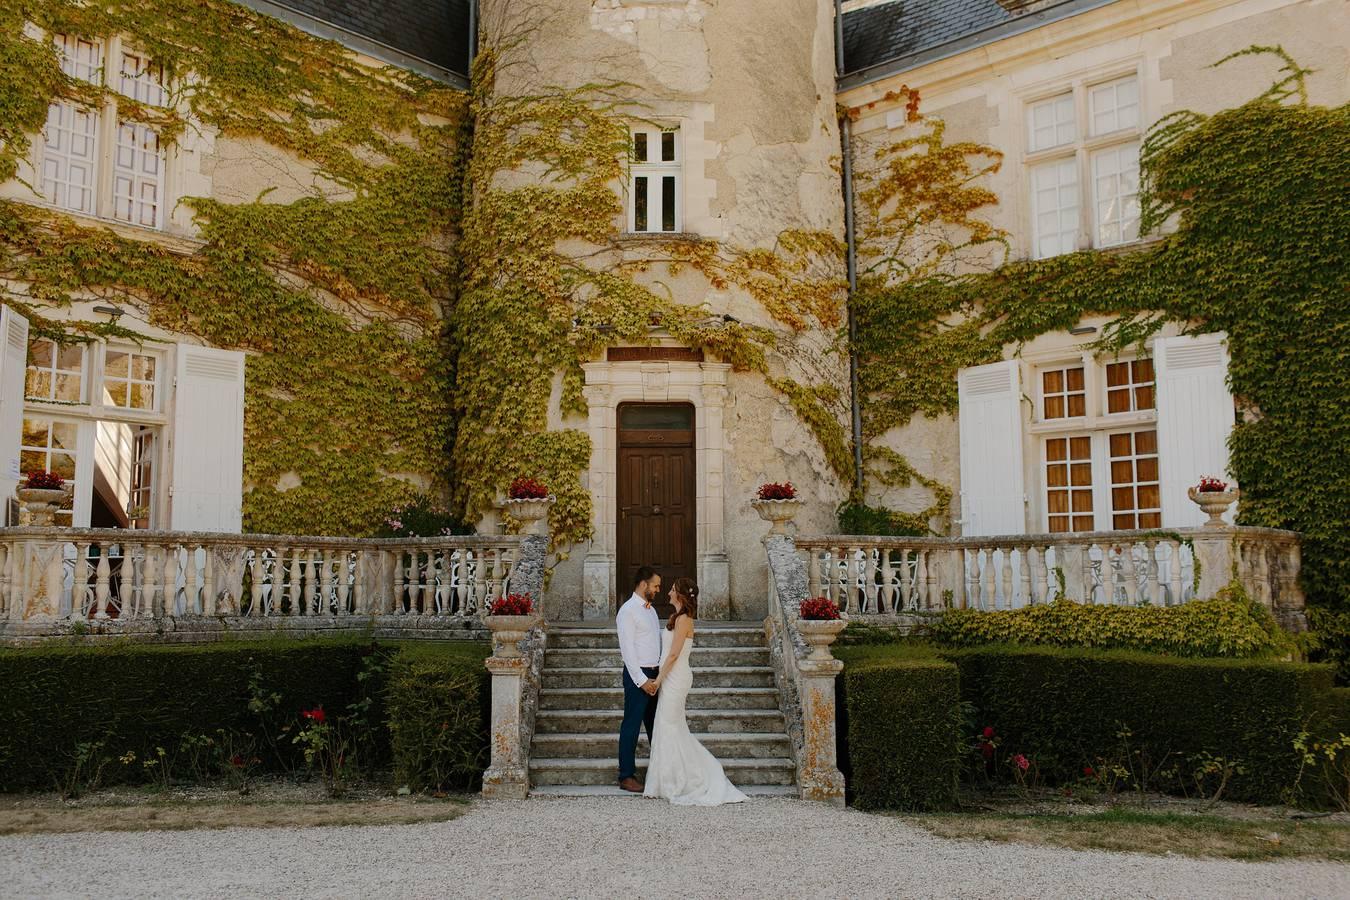 Hochzeitspaar (© Smart Photography Courses)